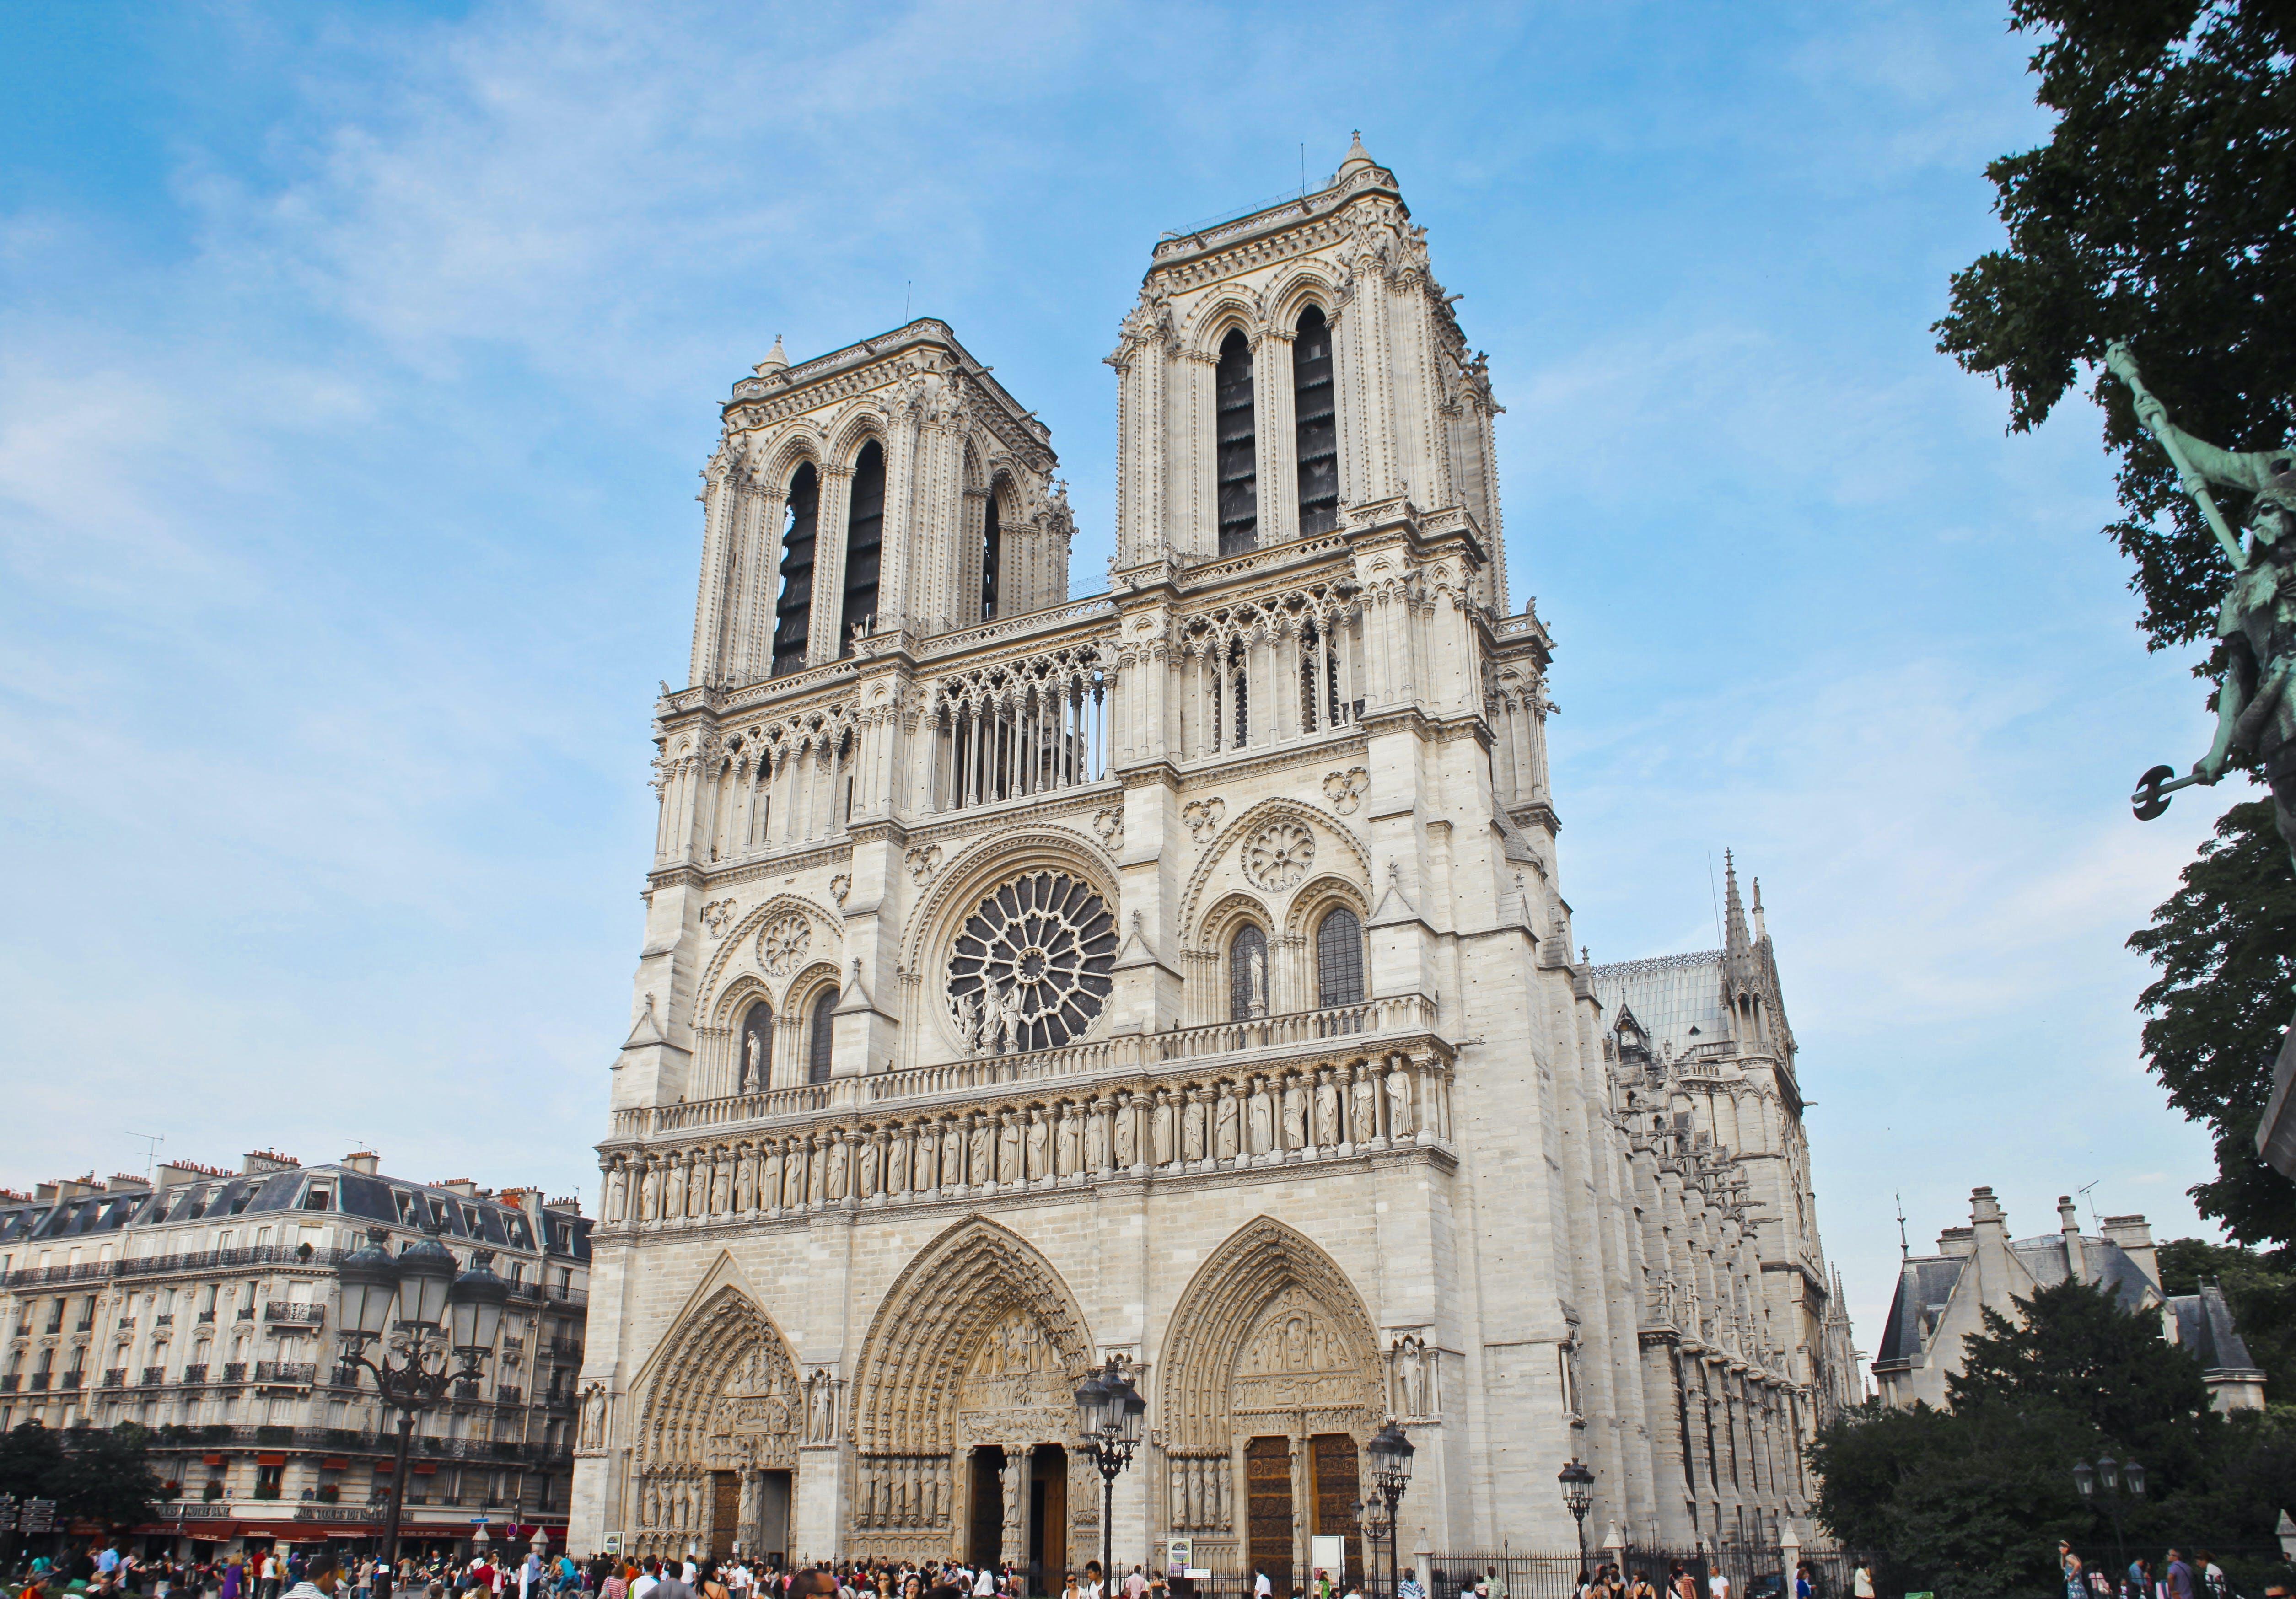 Aggiornamenti live: Fire at Notre Dame - CNN thumbnail